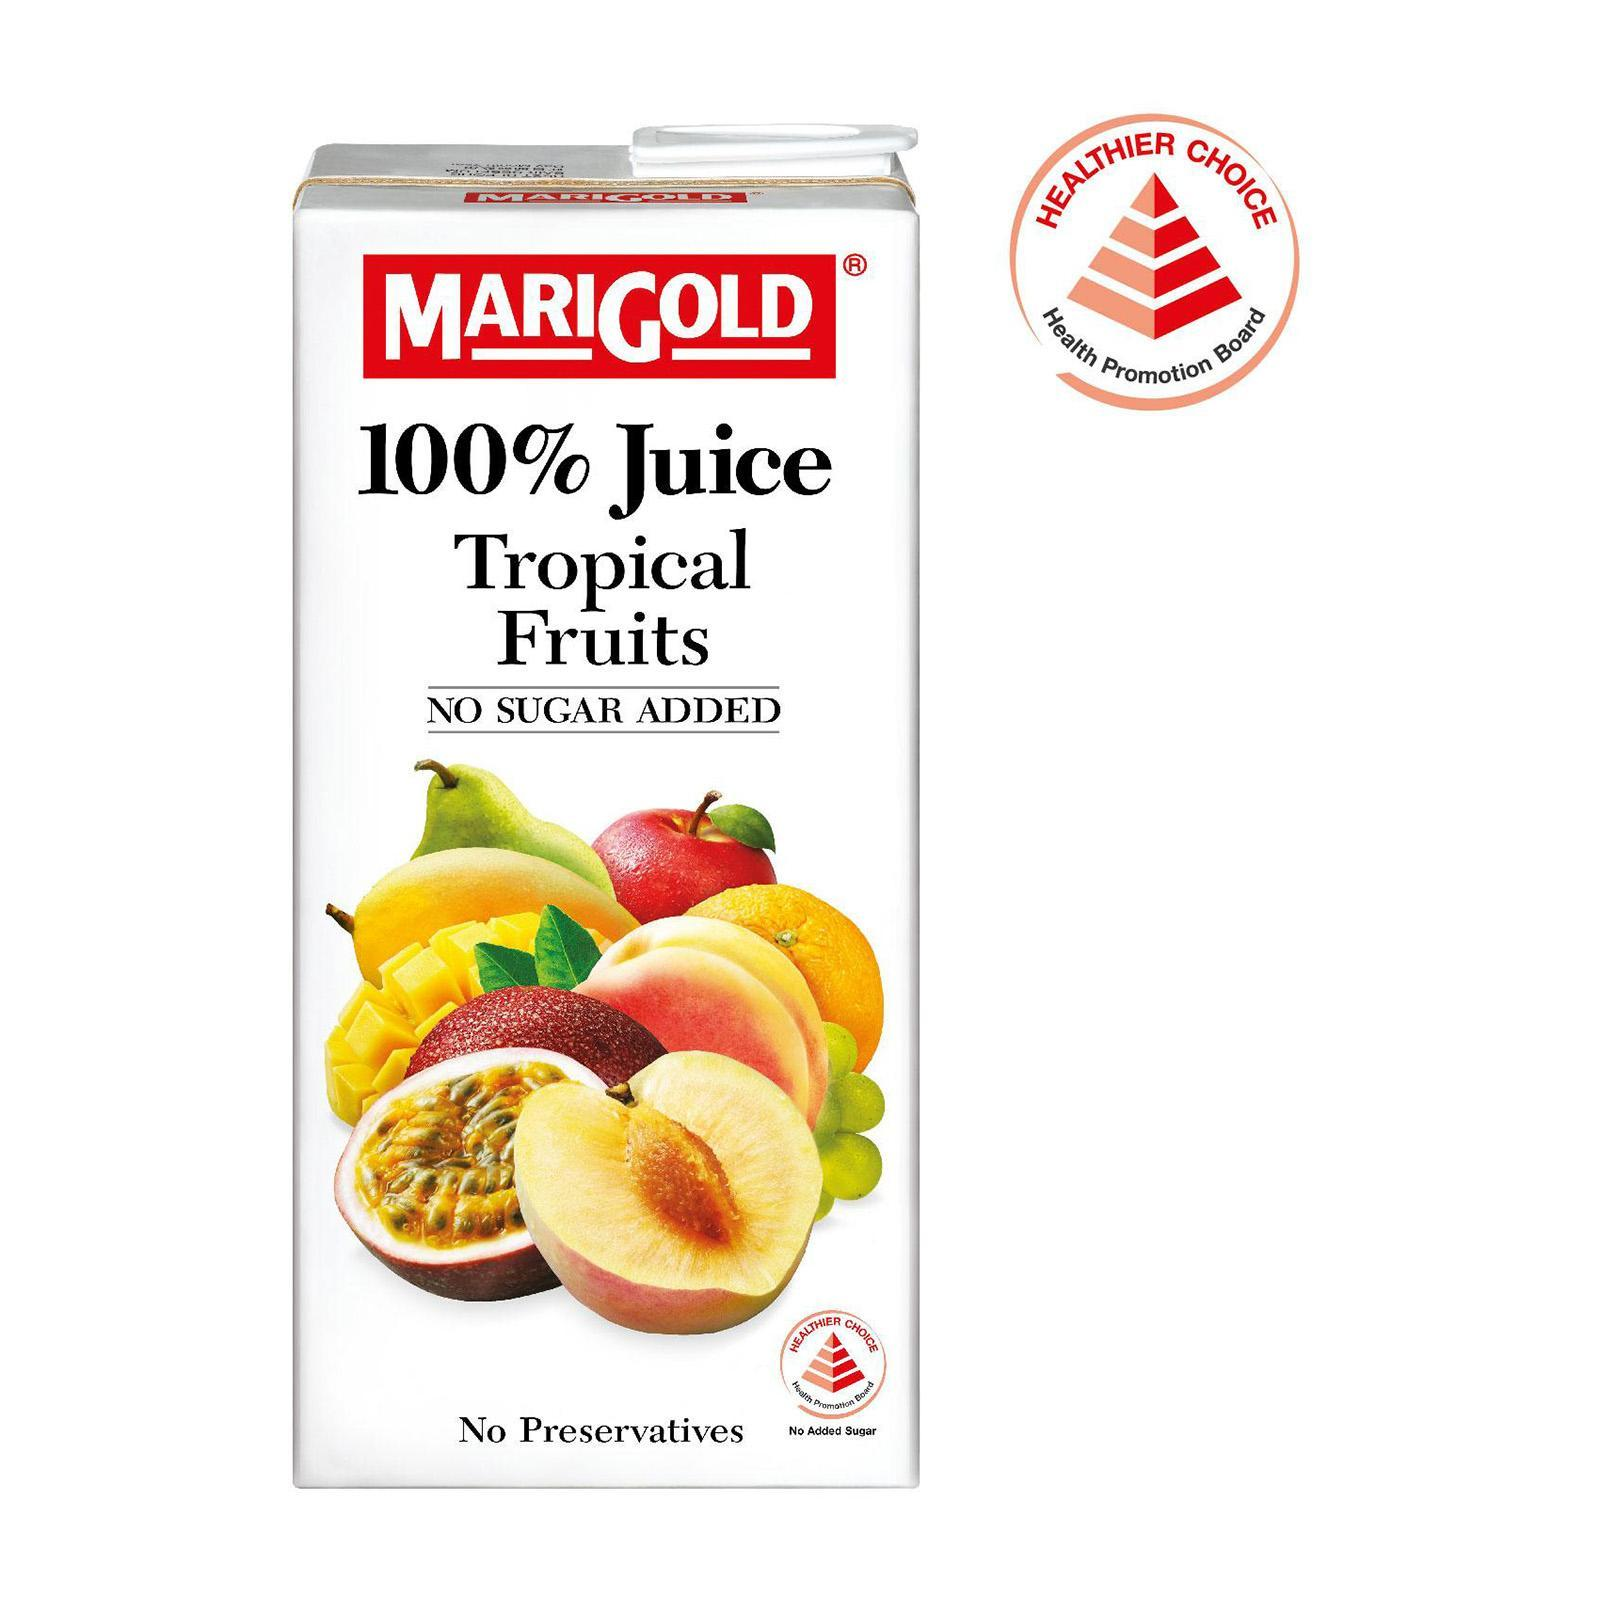 Marigold 100 Percent Tropical Fruits Juice Lazada Singapore